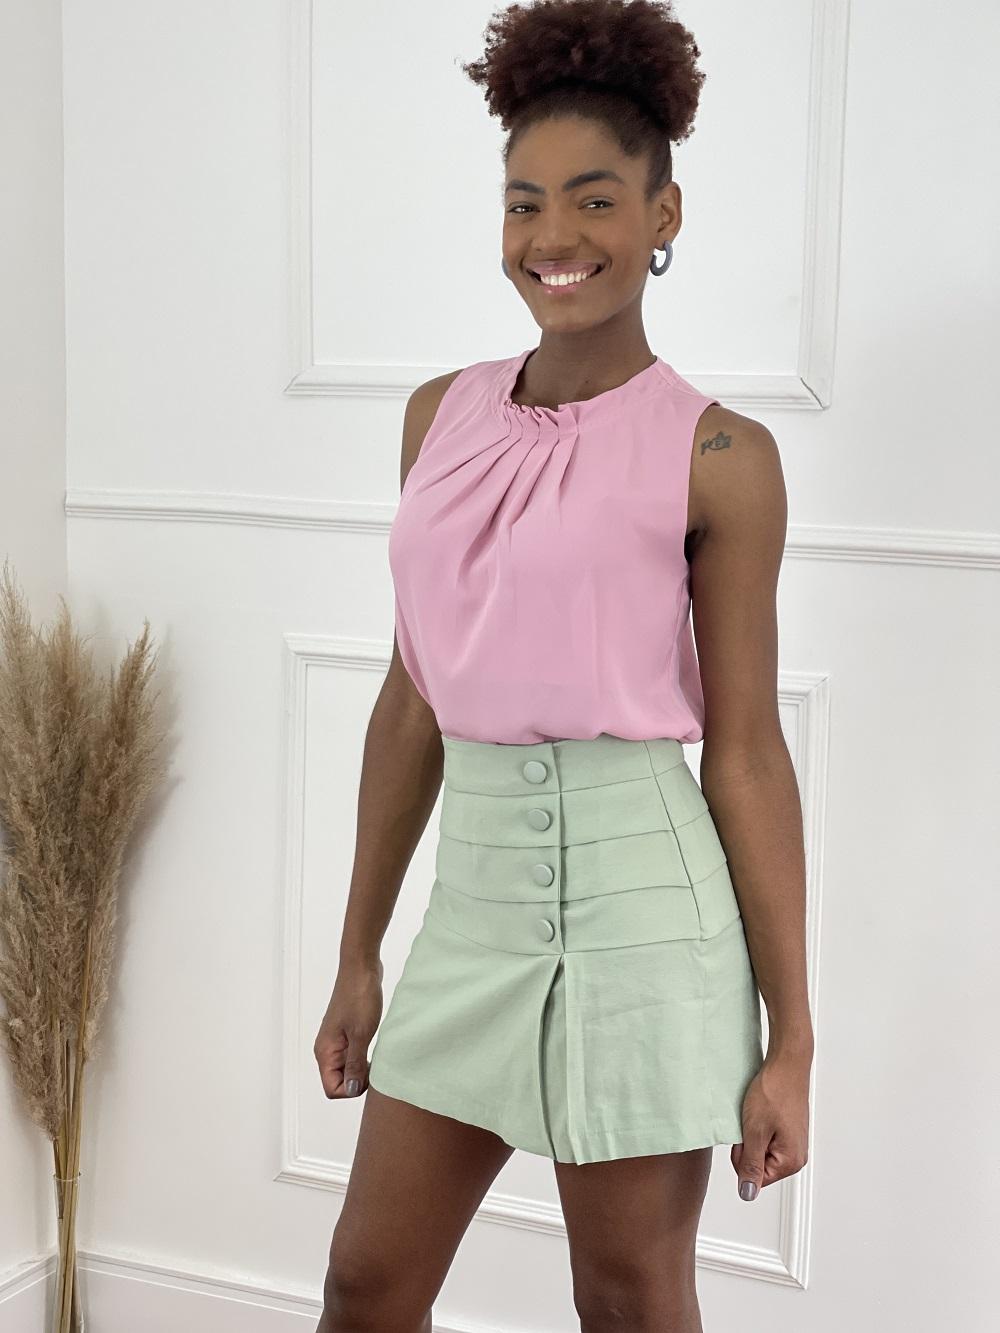 Look Pronto: Blusa Regata Plissada Colo Rosa + Shorts Saia Plissado Verde